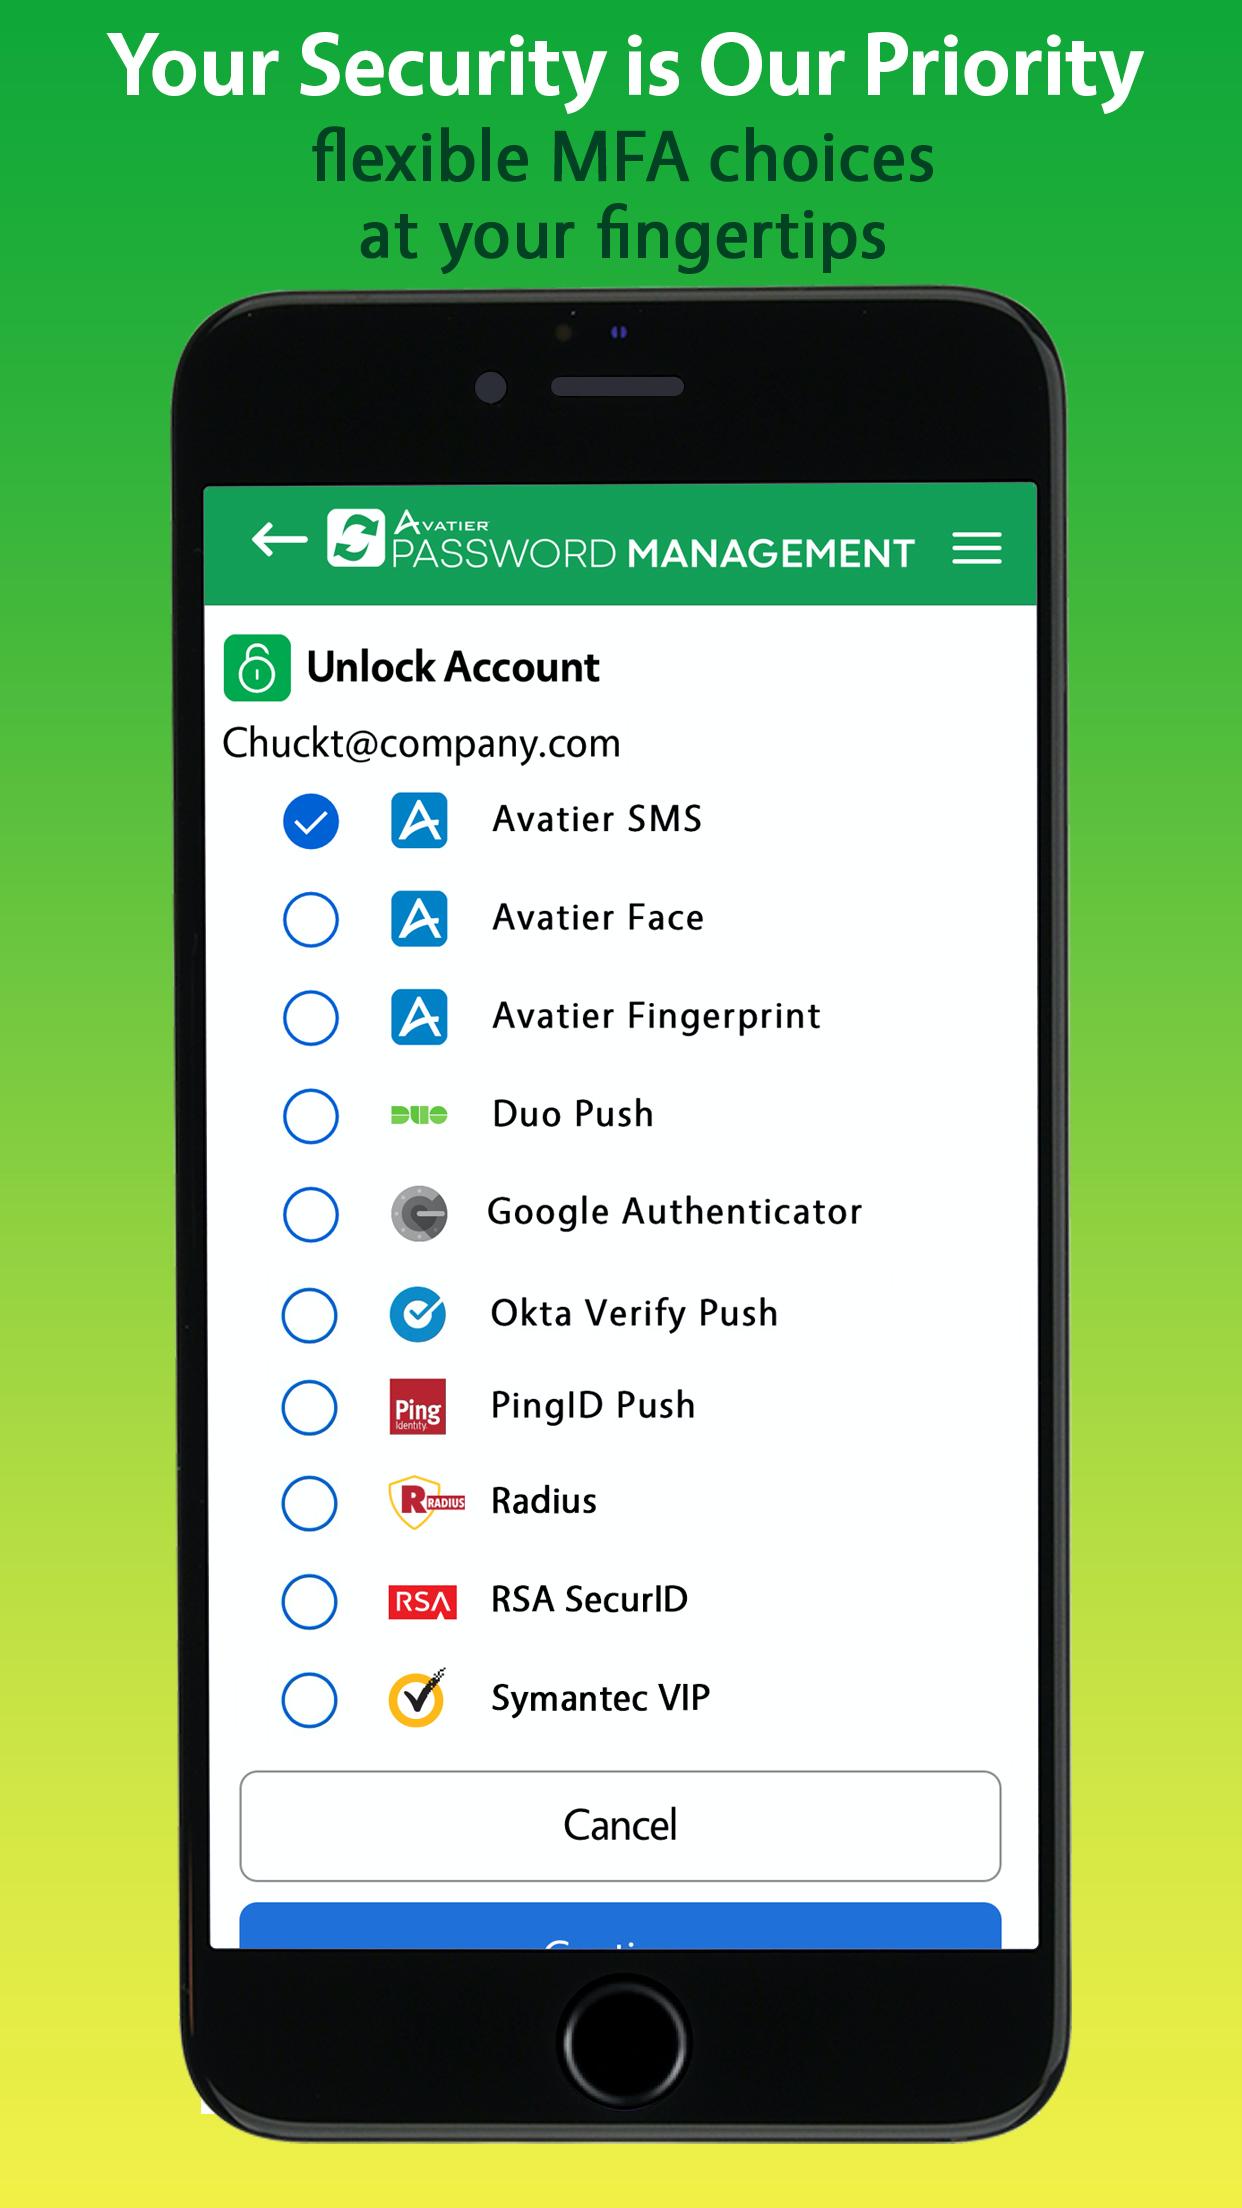 Avatier Identity Anywhere Software - Avatier Identity Anywhere Password Management